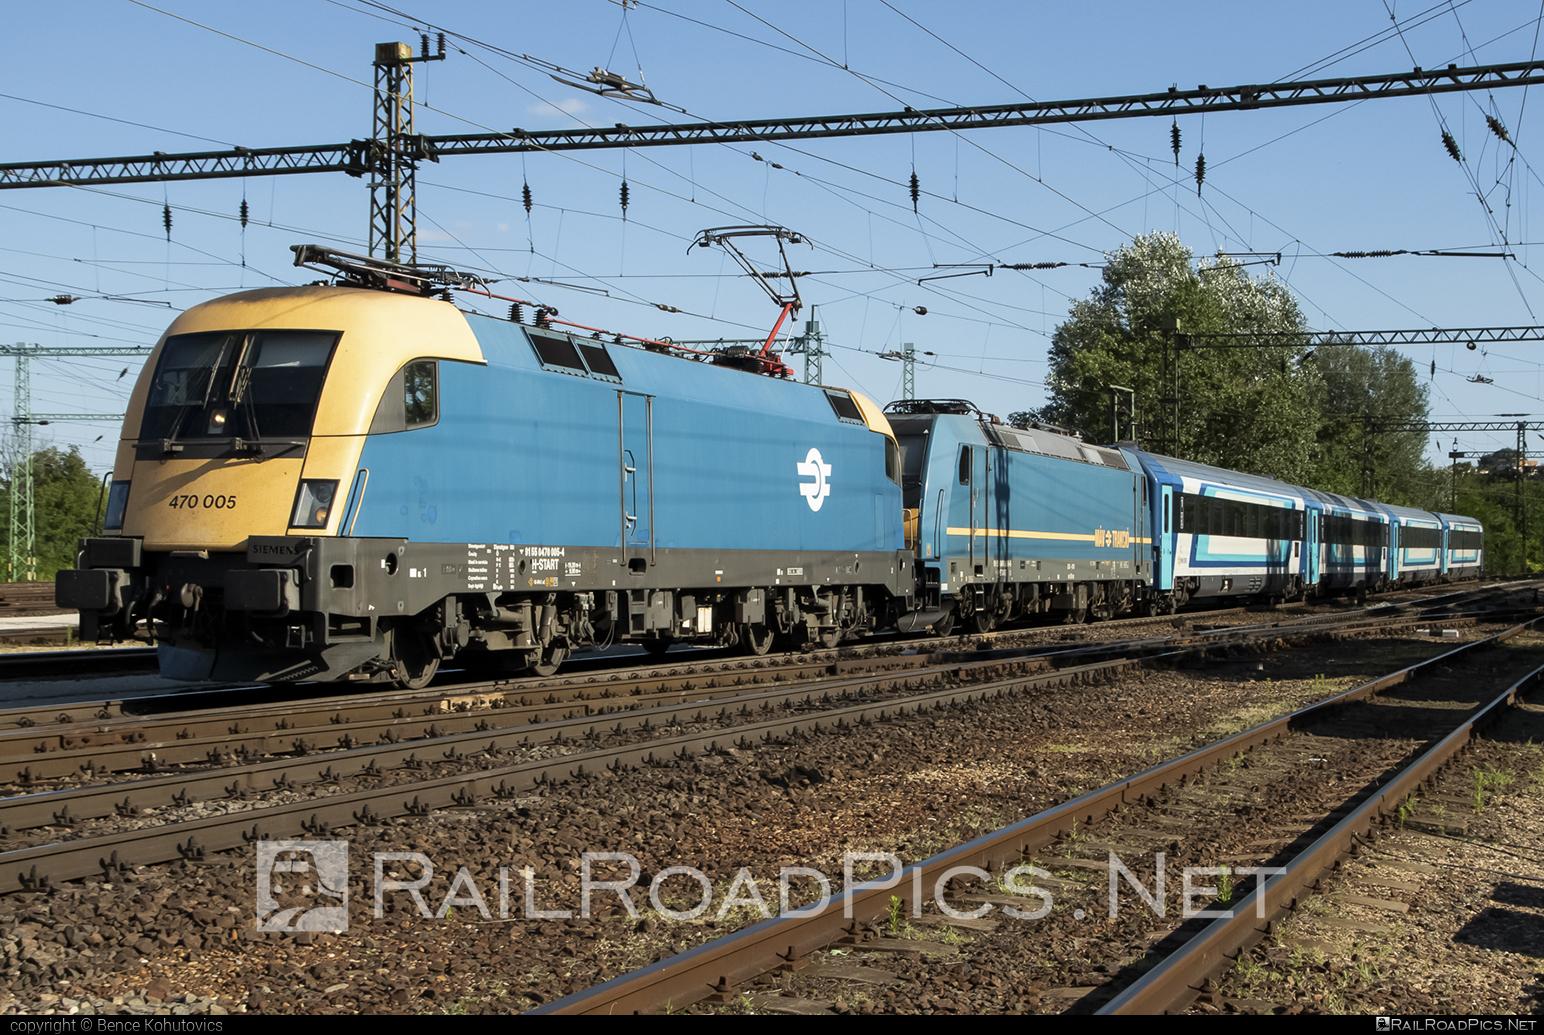 Siemens ES 64 U2 - 470 005 operated by MÁV-START ZRt. #es64 #es64u #es64u2 #eurosprinter #mav #mavstart #mavstartzrt #siemens #siemenses64 #siemenses64u #siemenses64u2 #siemenstaurus #taurus #tauruslocomotive